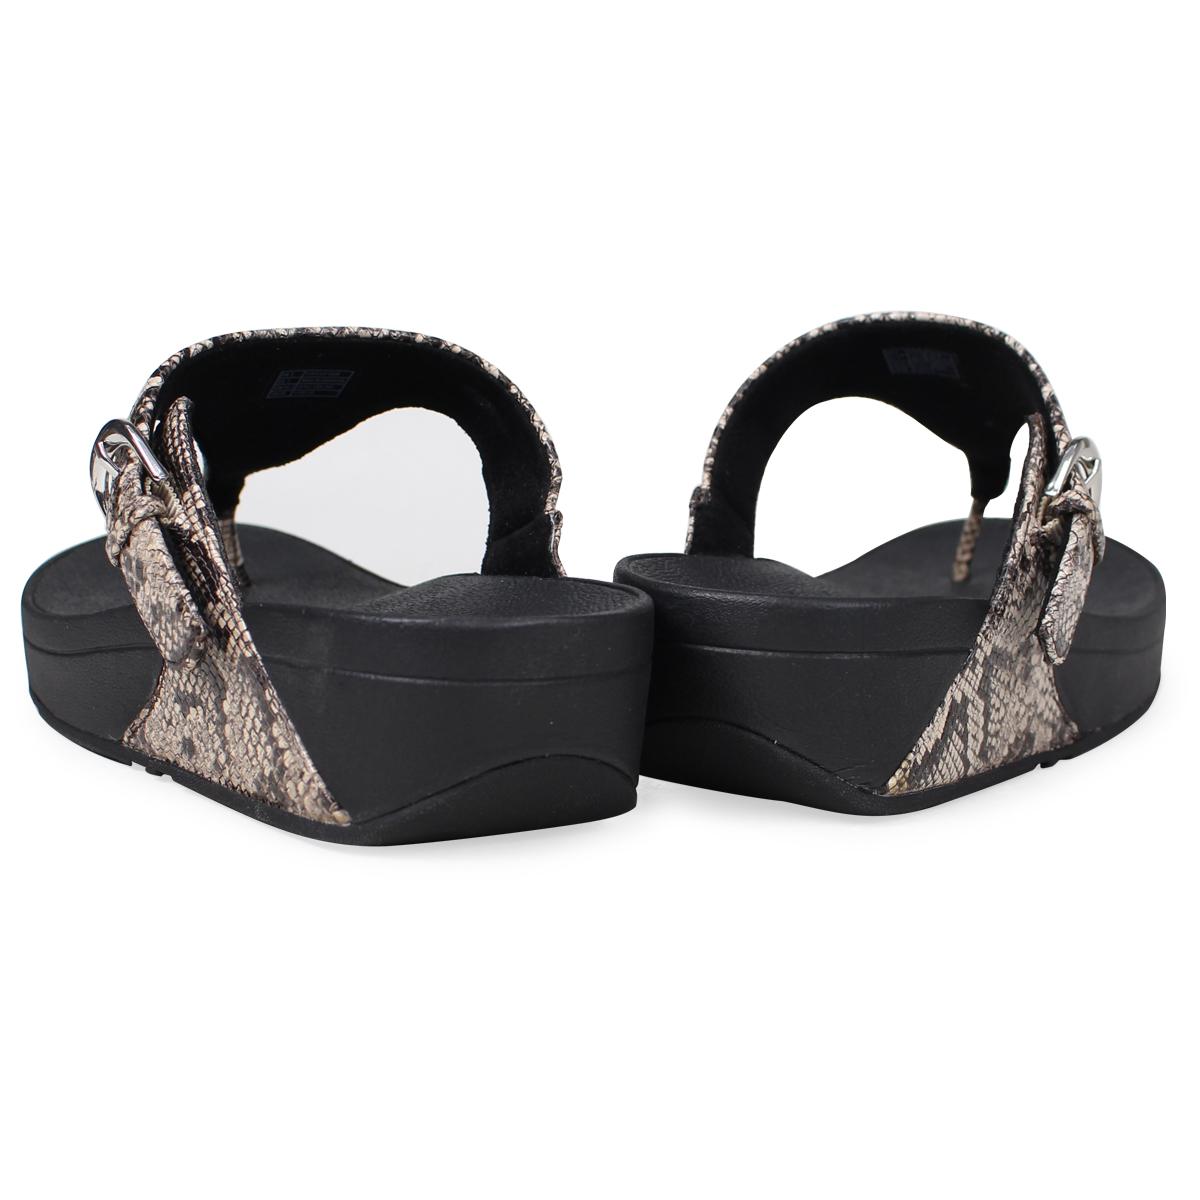 053d9d53c87d FitFlop sandals fitting FLOPS Kinney SKINNY TOE-THONG SANDALS SNAKE PRINT  LEATHER Lady s L69 black  4 4 Shinnyu load